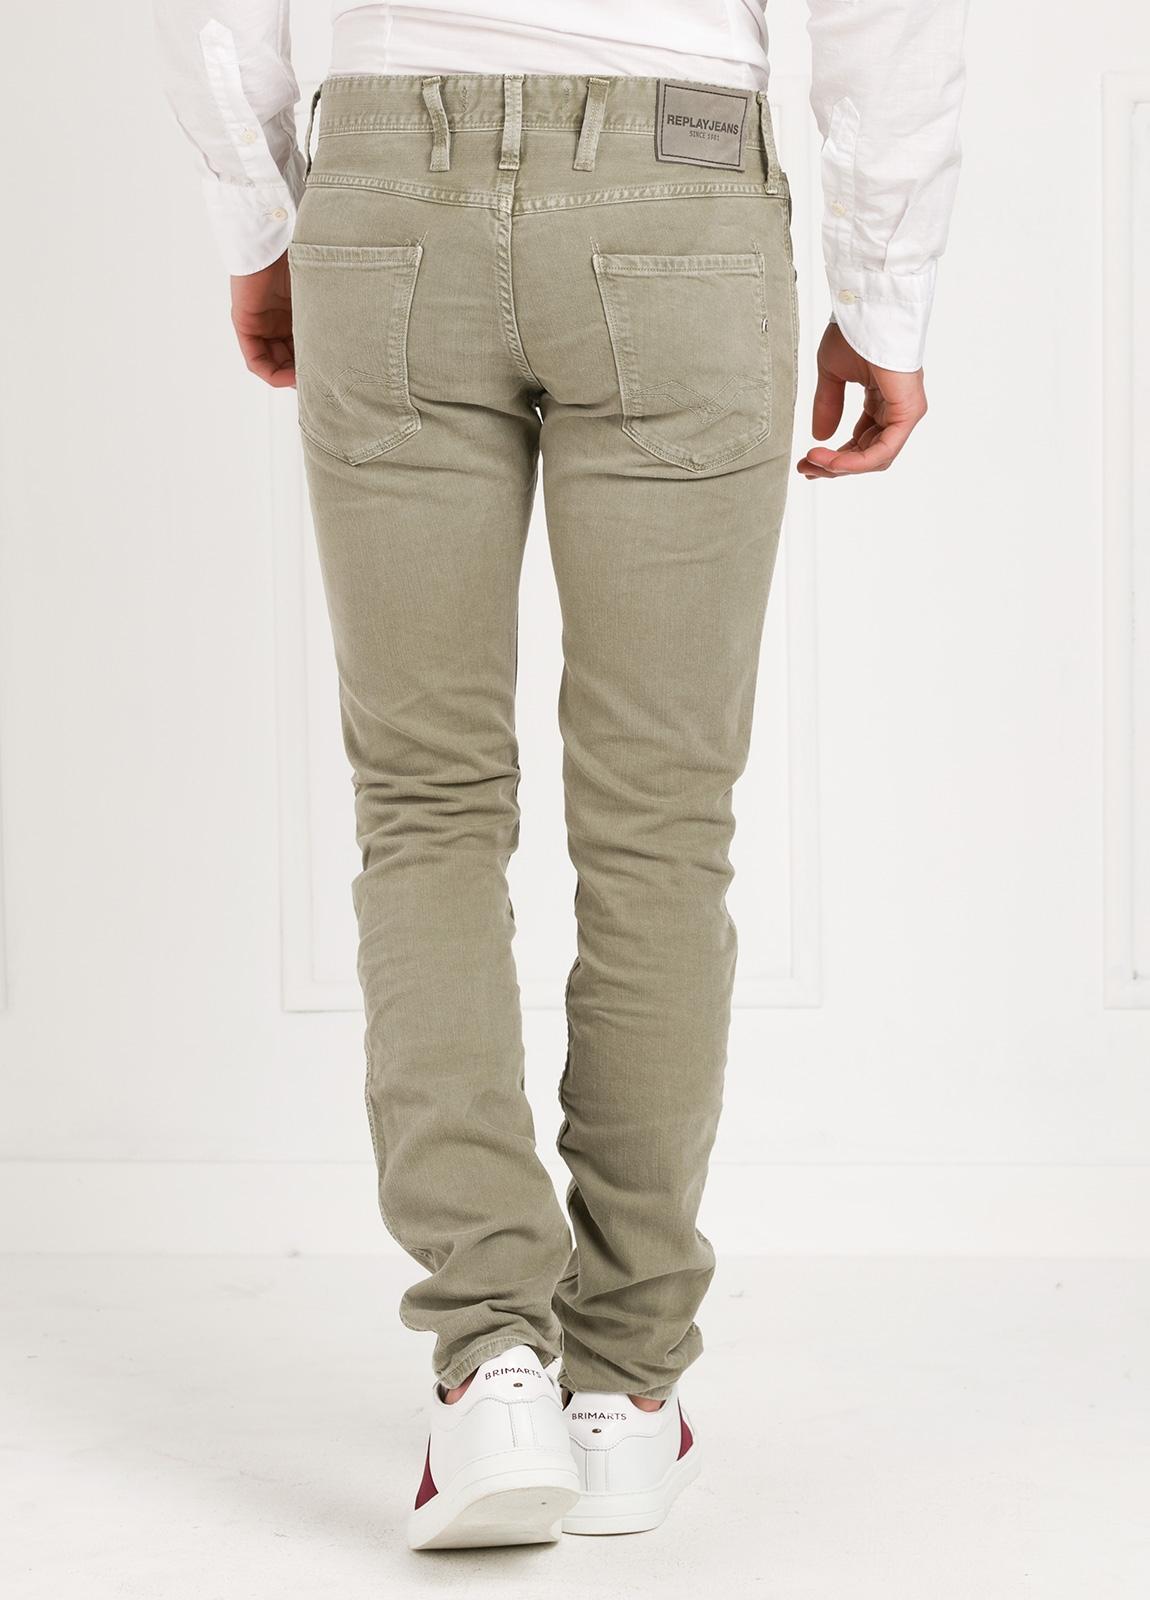 Pantalón tejano SLIM FIT M914D ANBASS color kaki lavado algodón - Ítem1